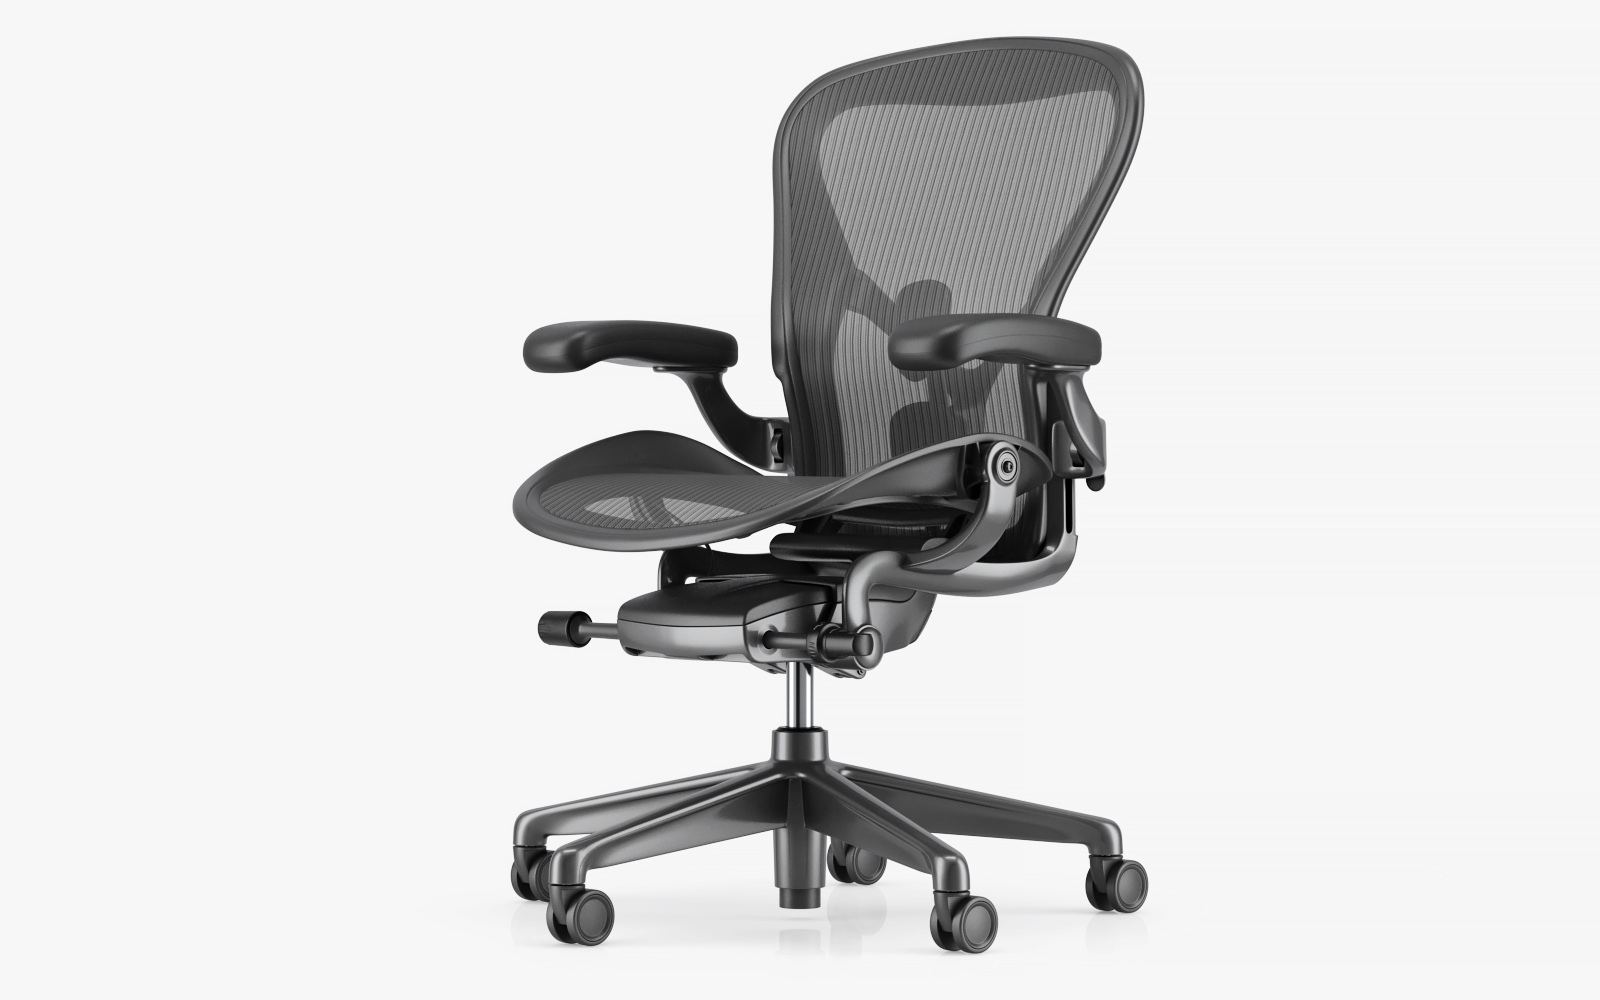 Groovy Herman Miller Aeron Office Chair Forskolin Free Trial Chair Design Images Forskolin Free Trialorg